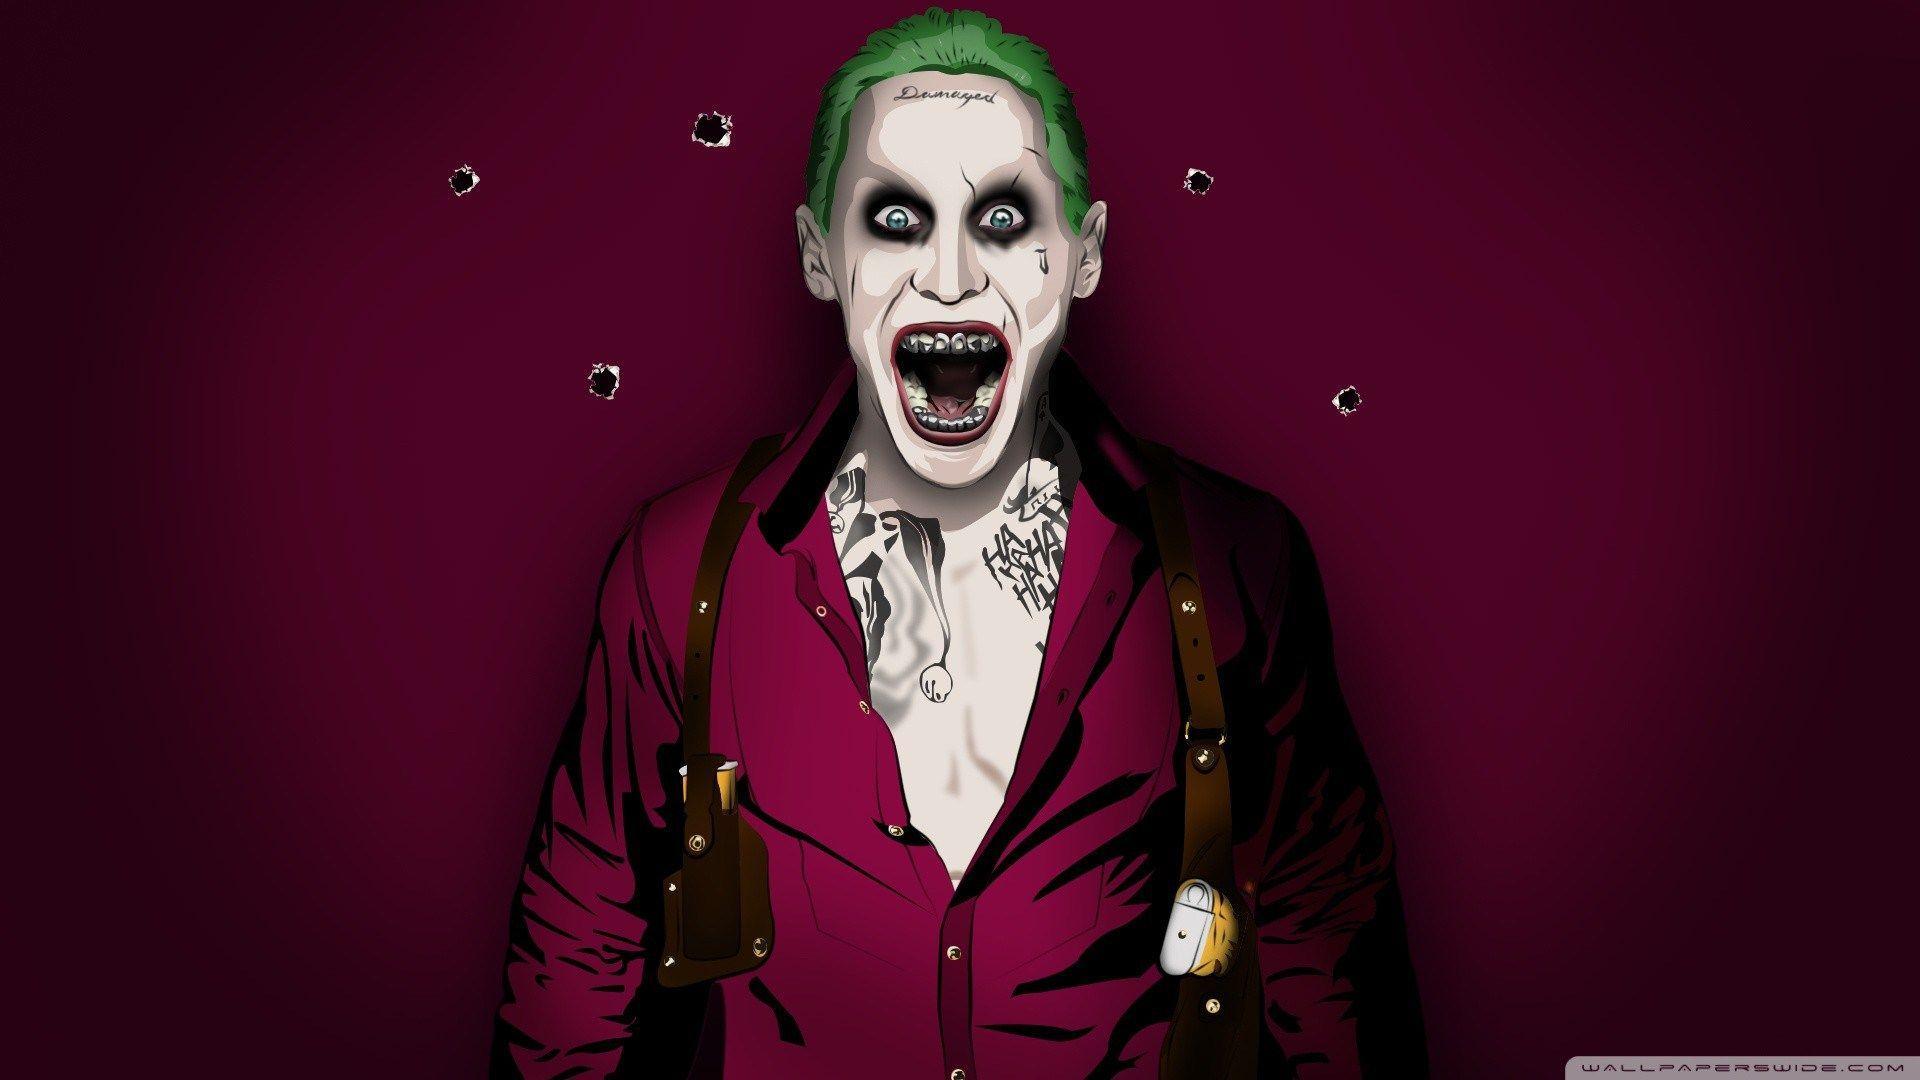 Joker Hd Wallpapers 1080p 4k Wallpaper Collections